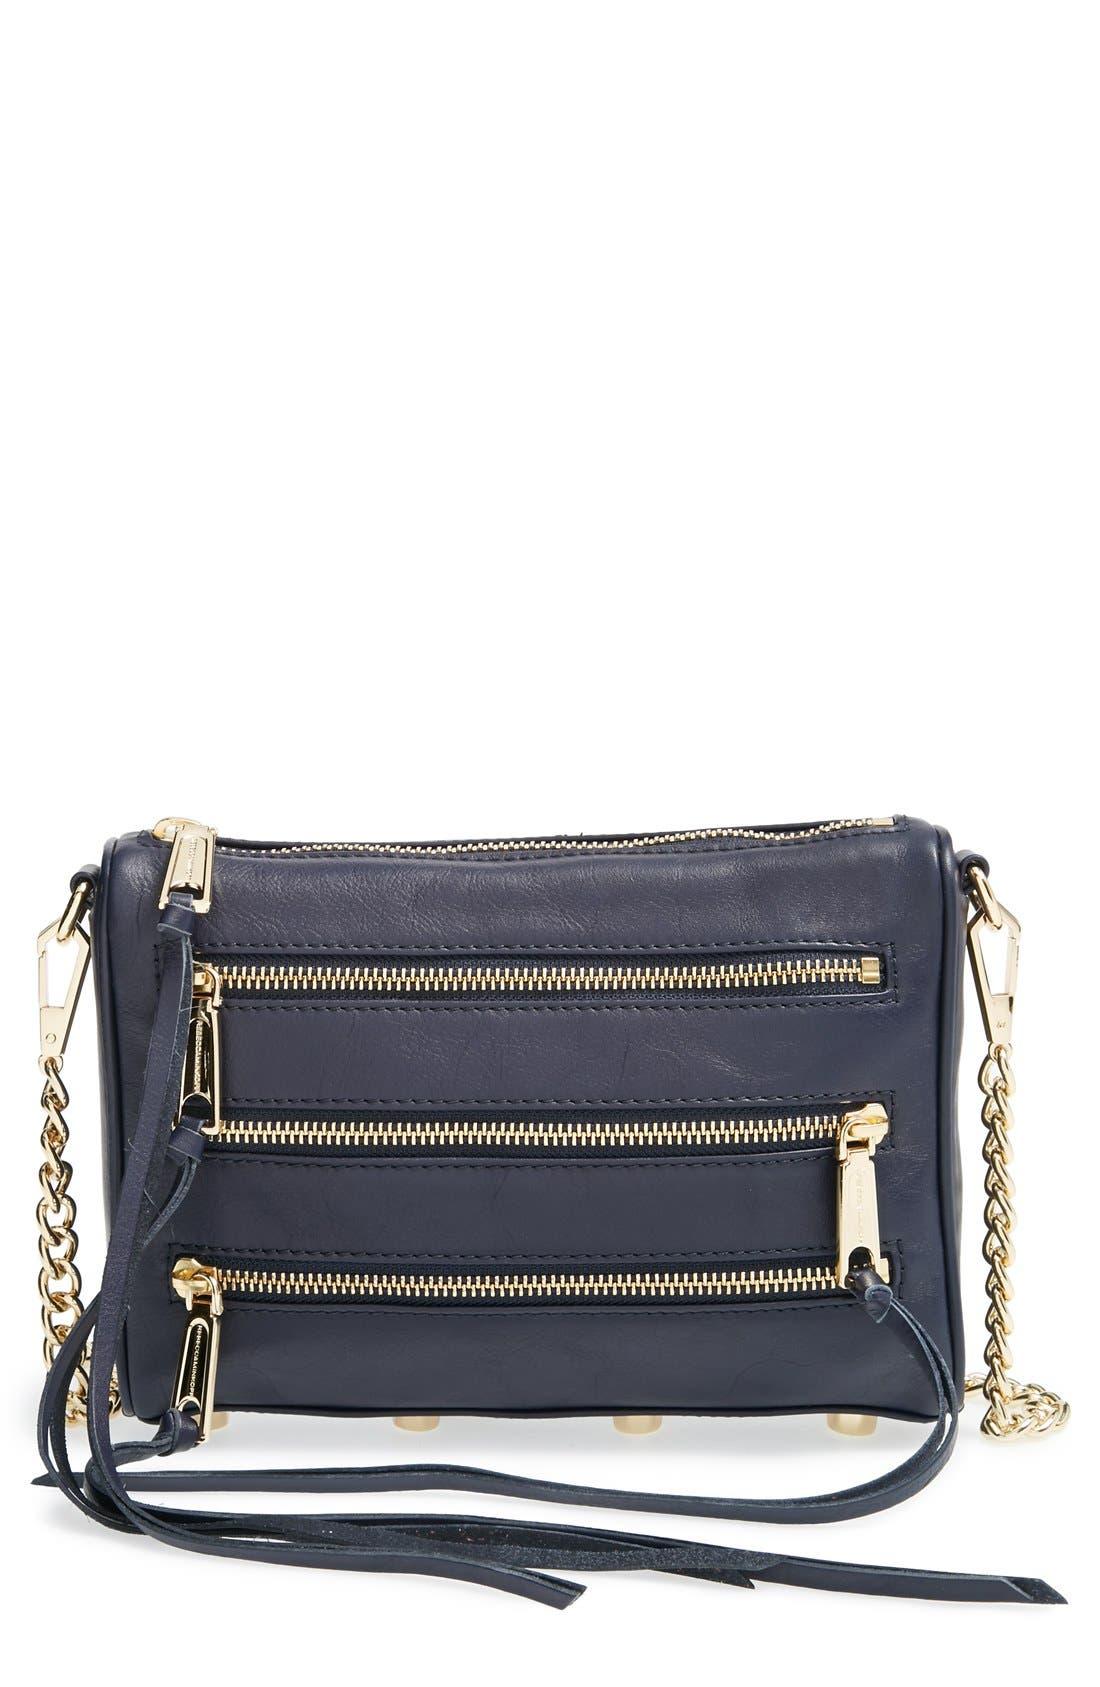 Main Image - Rebecca Minkoff 'Mini 5-Zip' Convertible Crossbody Bag